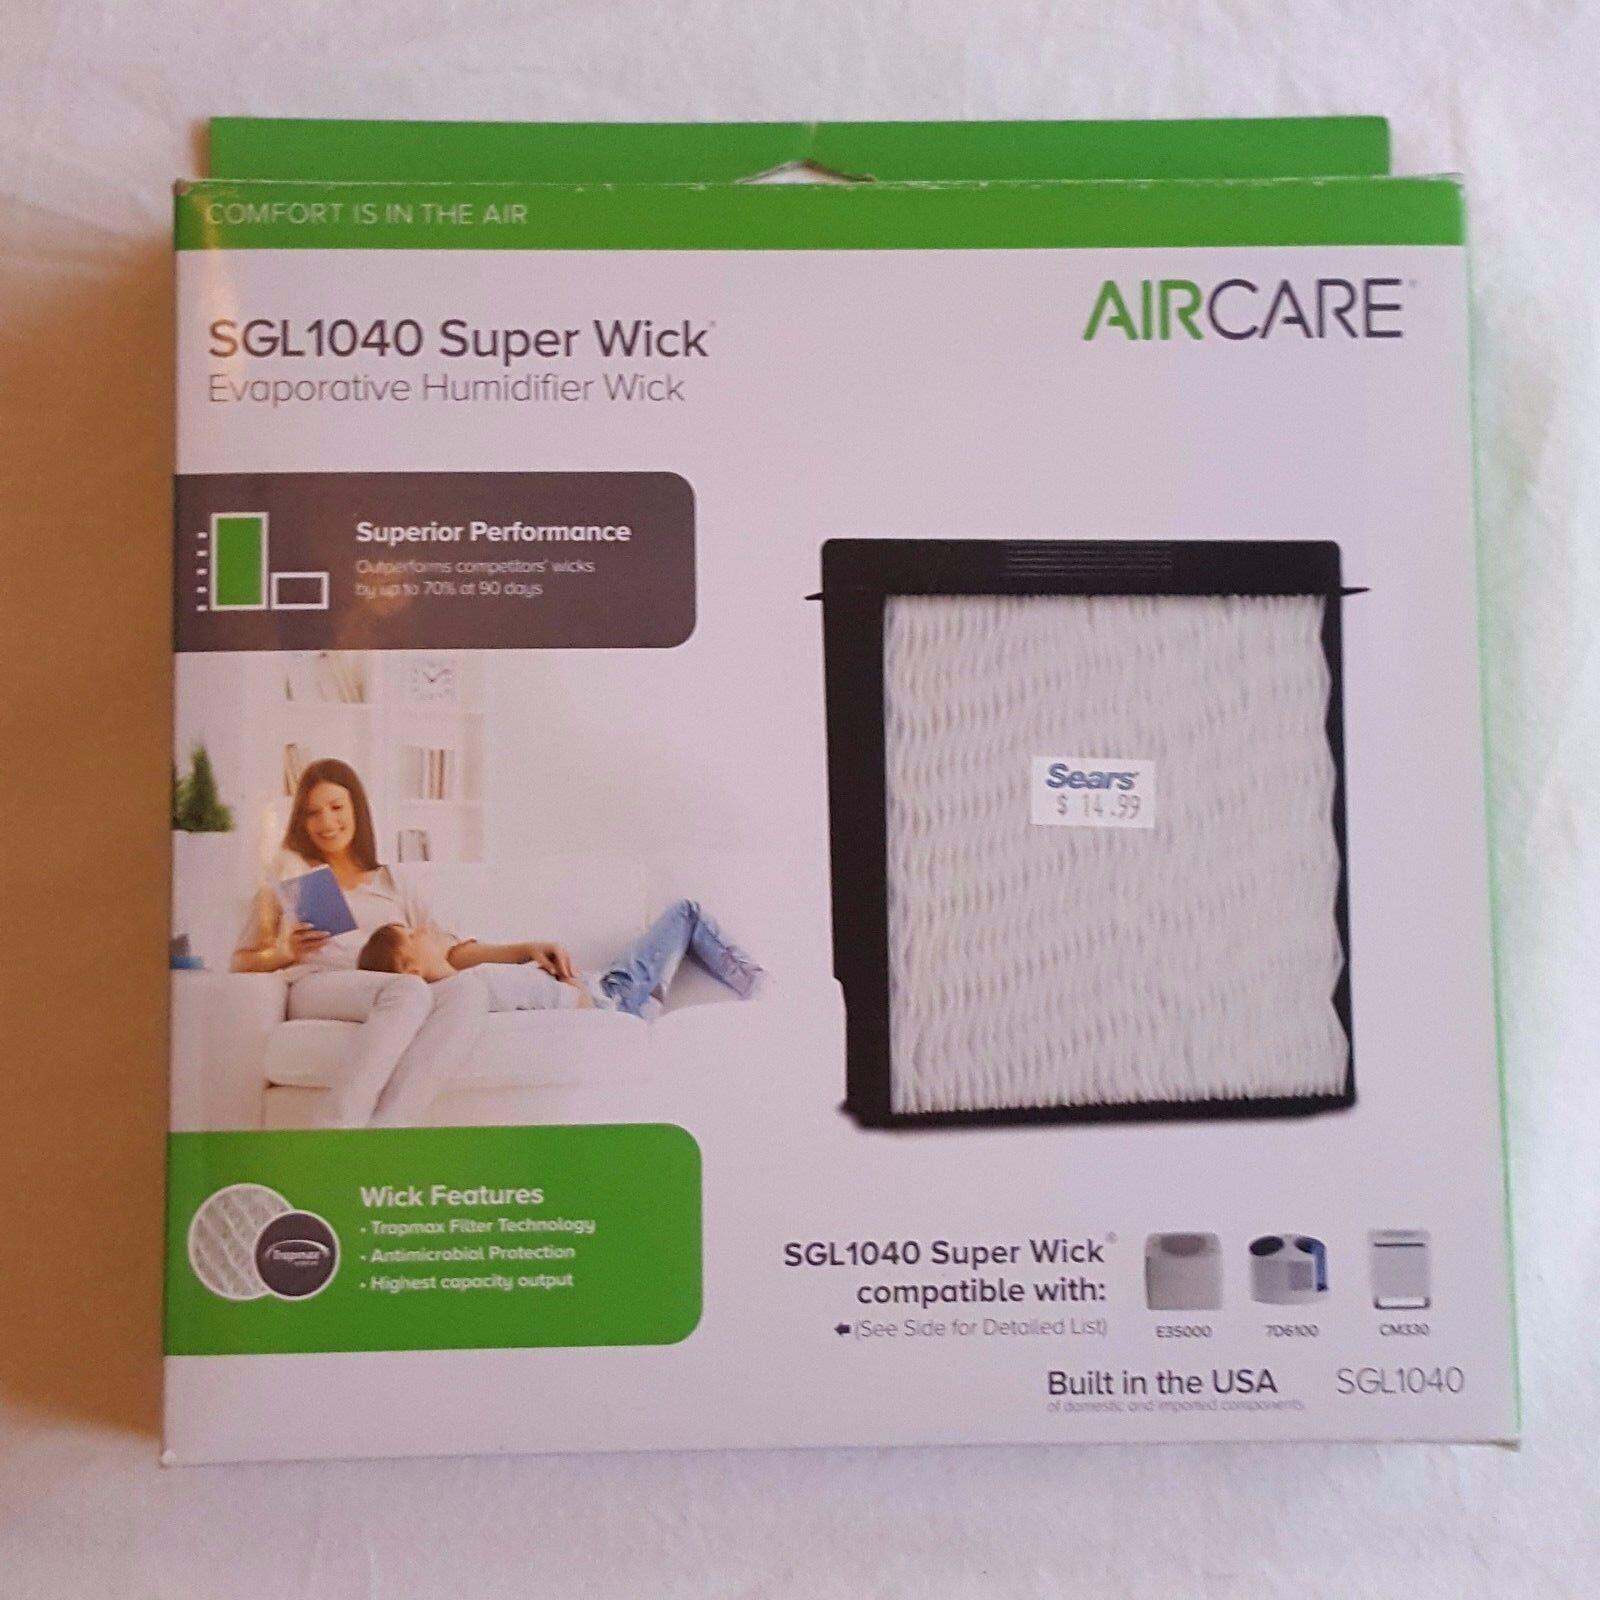 AIRCARE SGL1040 Super Wick , Humidifier Wick Filter